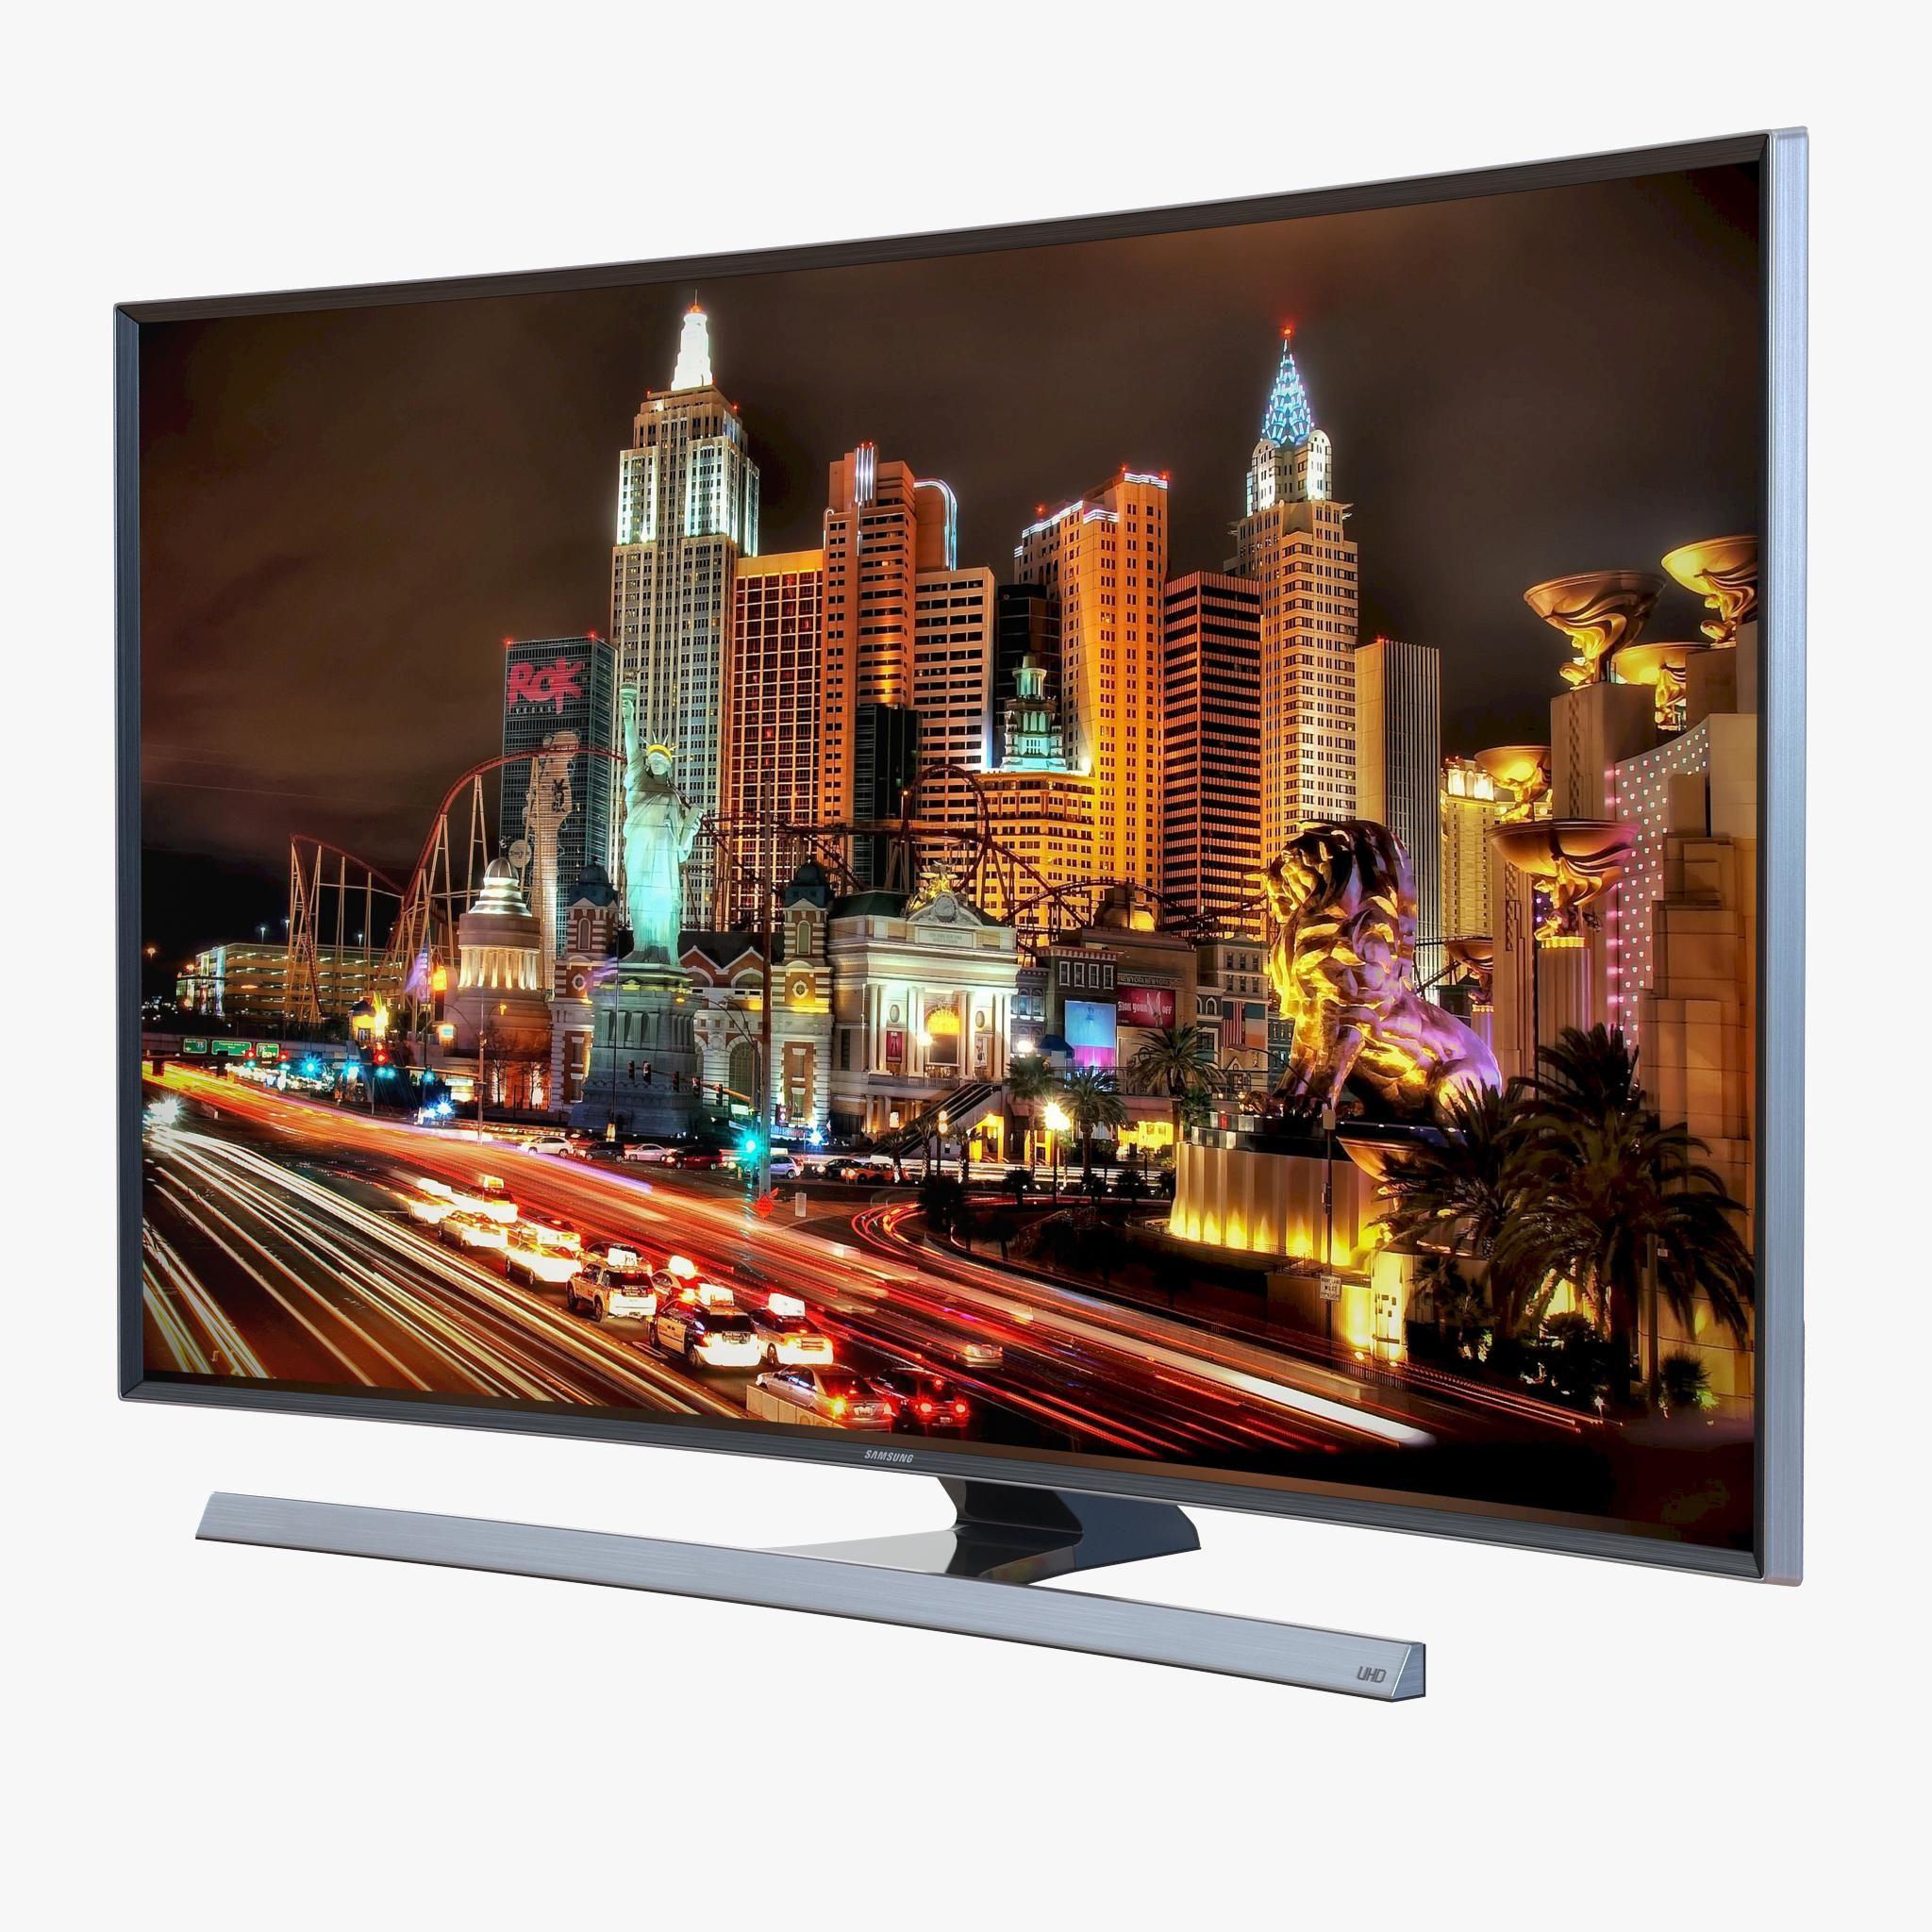 Samsung 4K UHD JU7500 Series Curved Smart TV 40 inch 3D